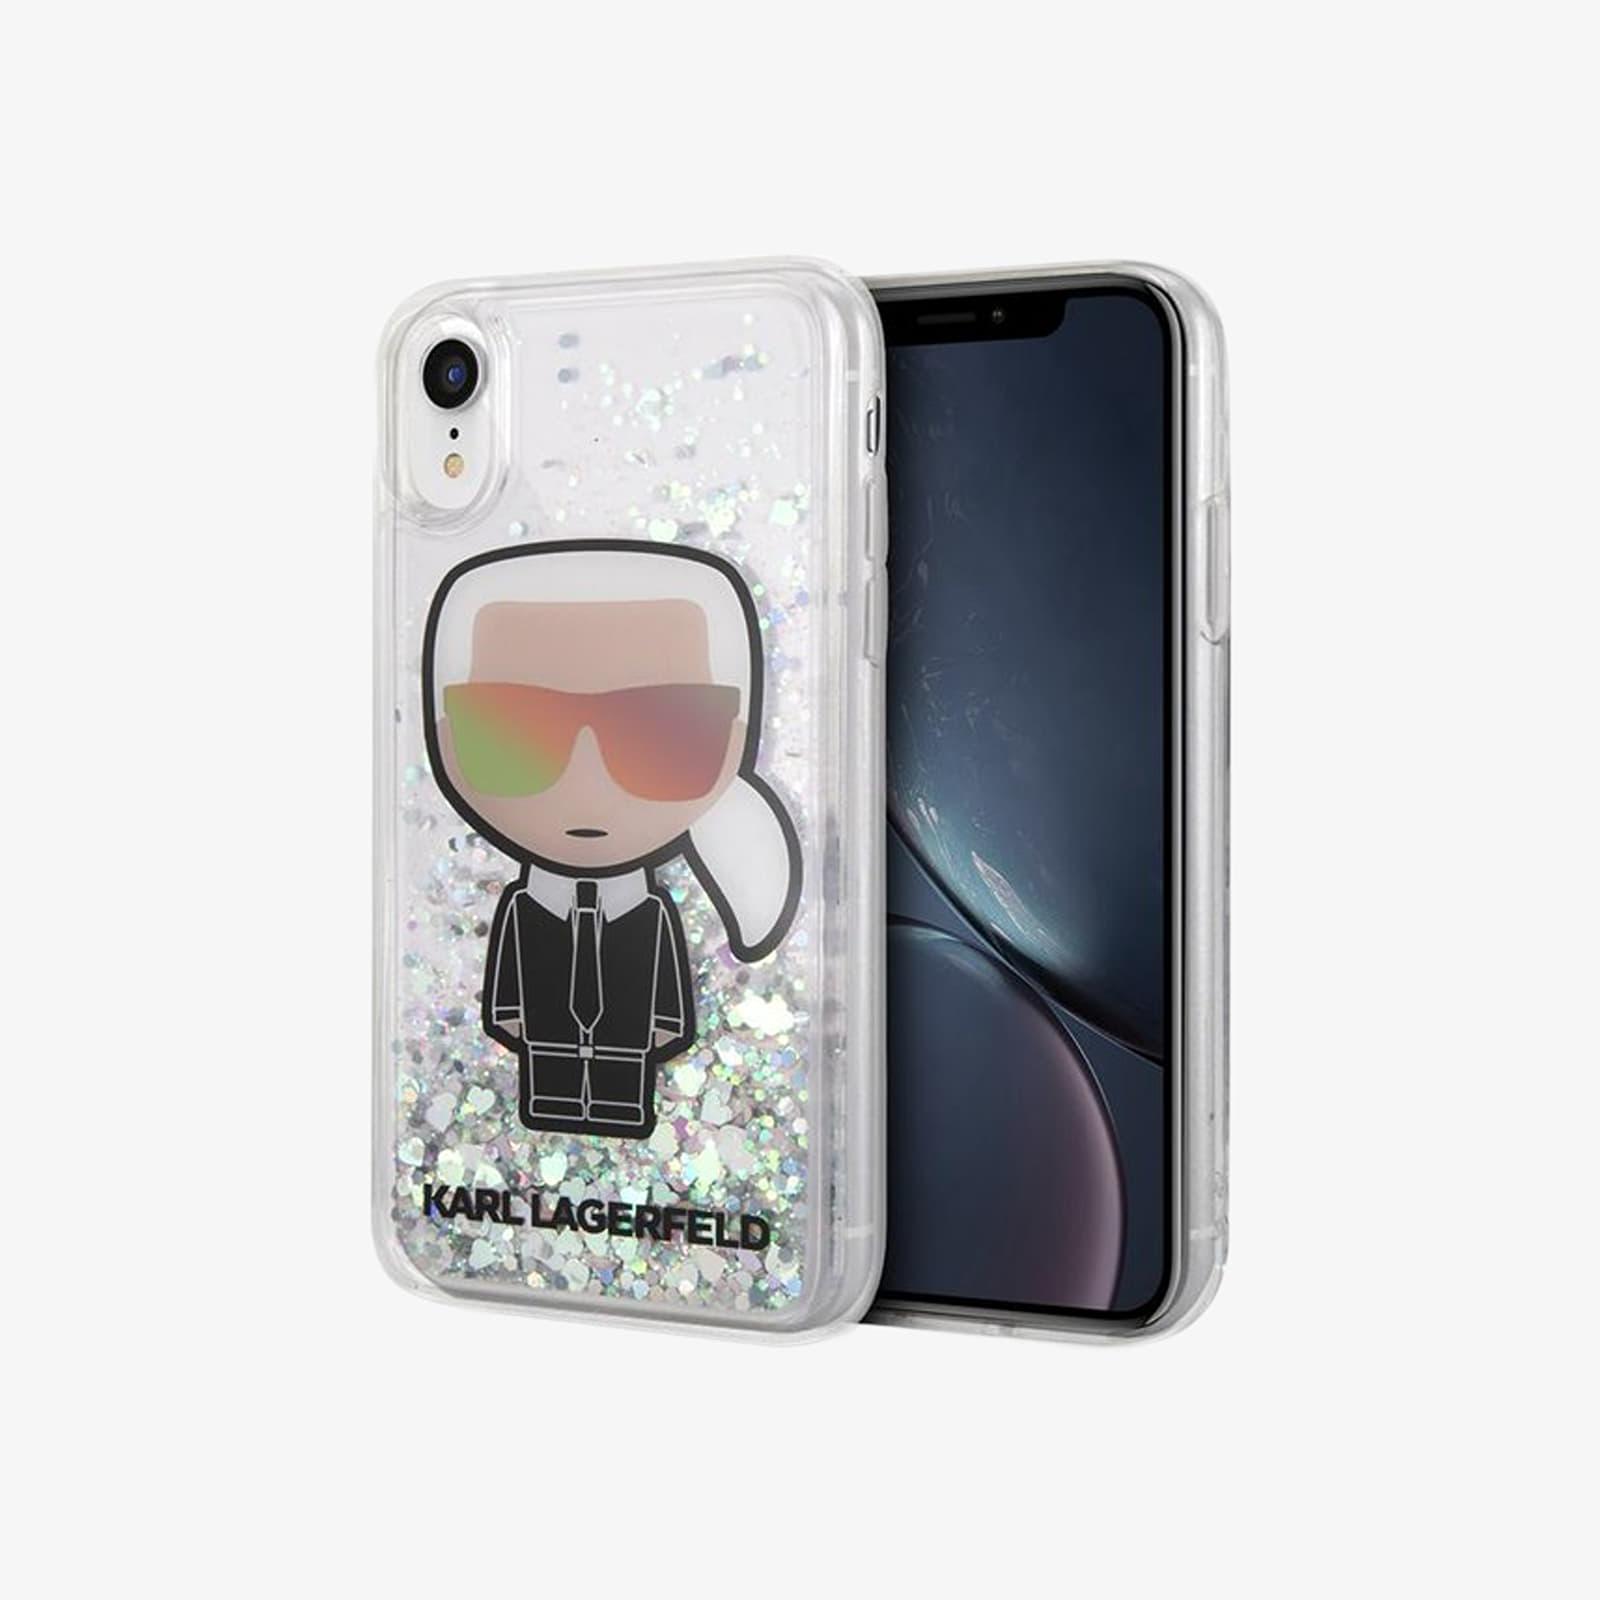 Karl Lagerfeld Iconic Liquid Glitter iPhone XS Max Case